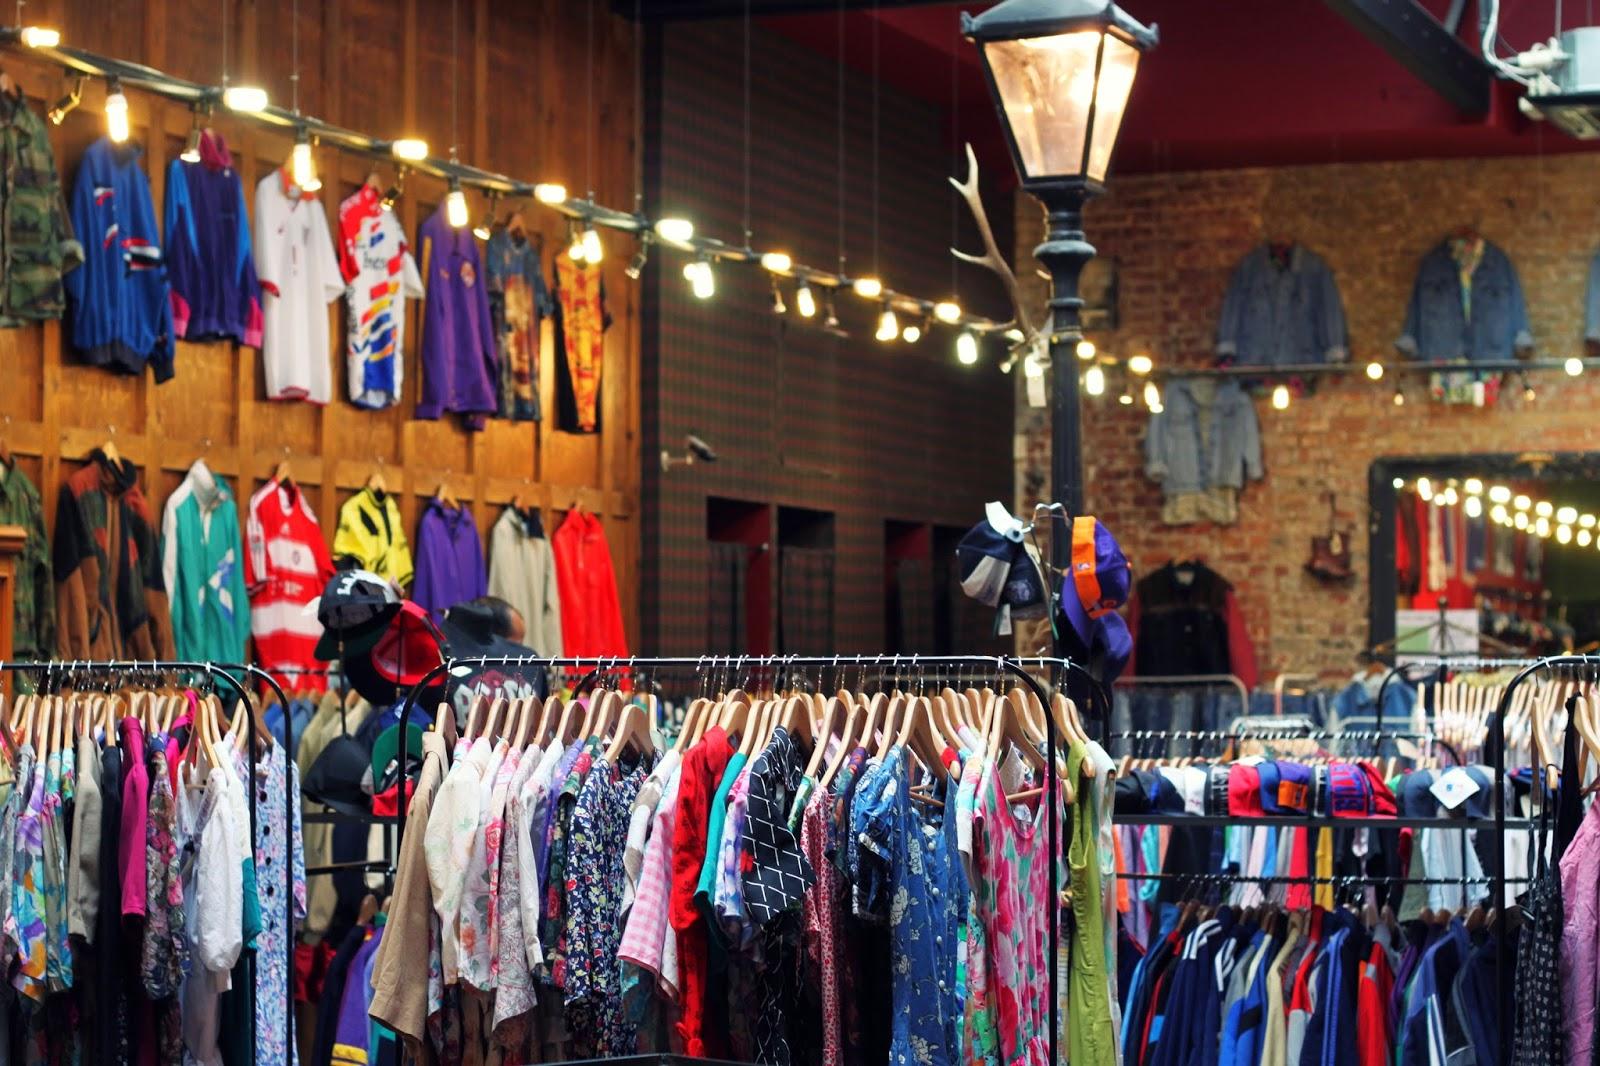 London clothing store